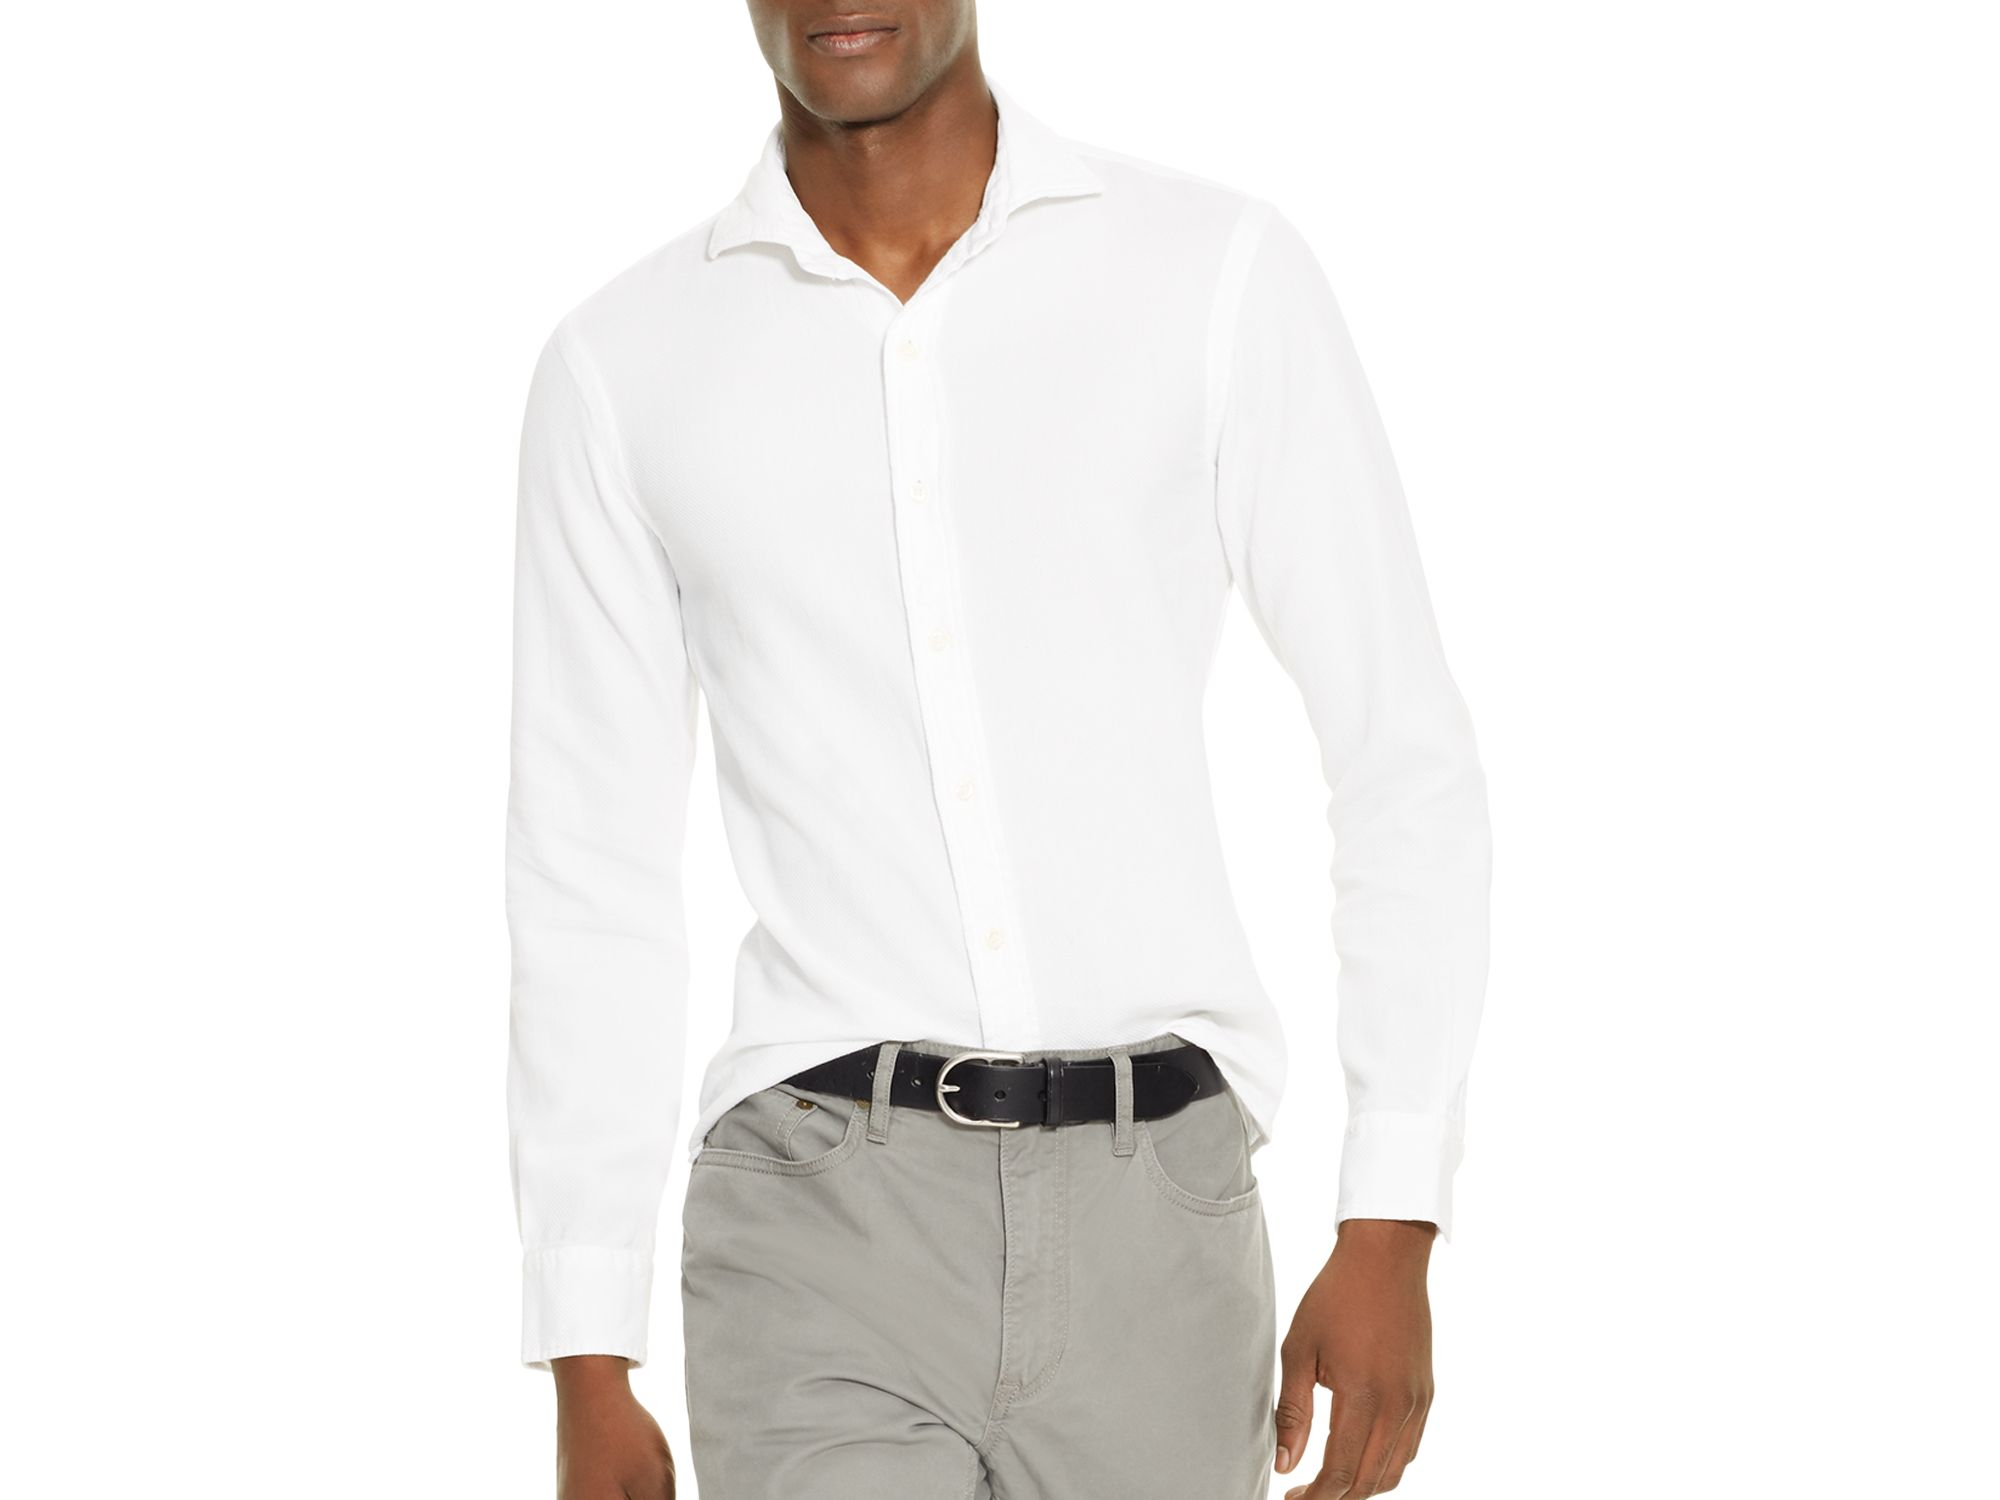 Polo ralph lauren estate slim fit button down shirt in for Slim fit white button down shirt